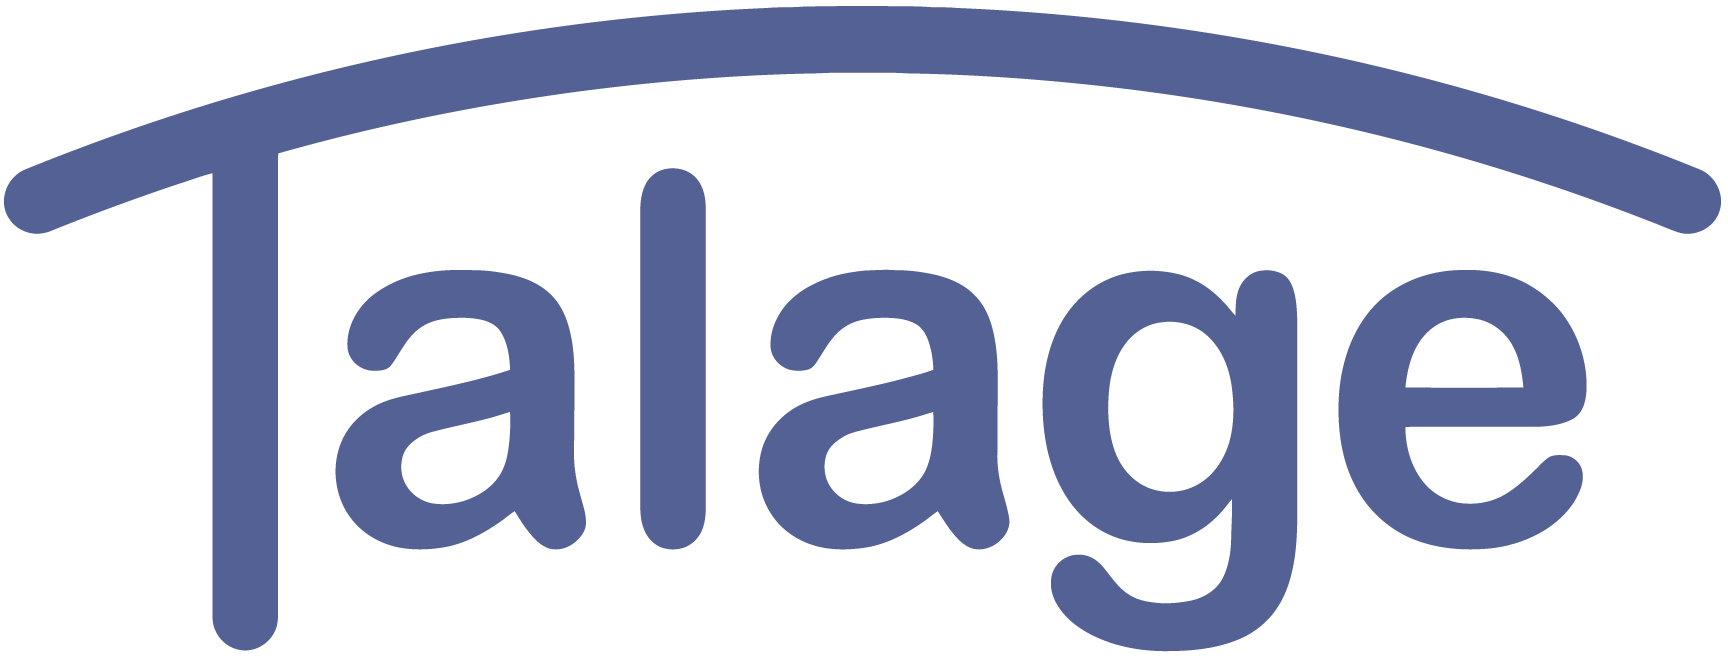 Talage Inc